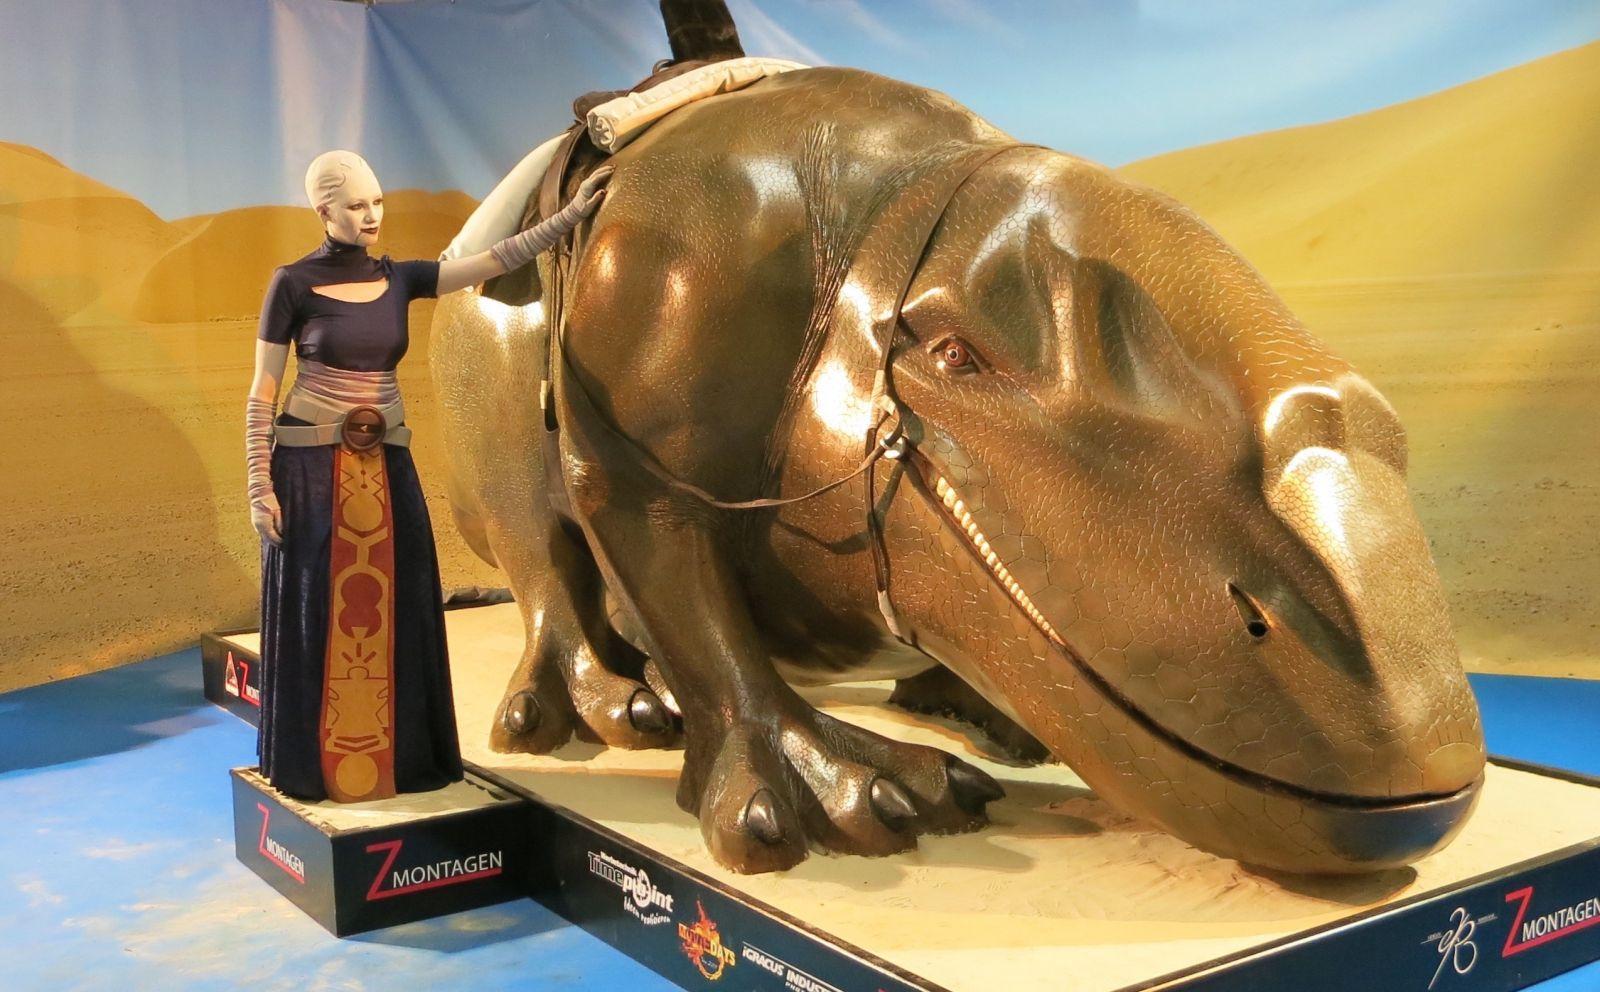 Asajj Ventress and her pet dewback